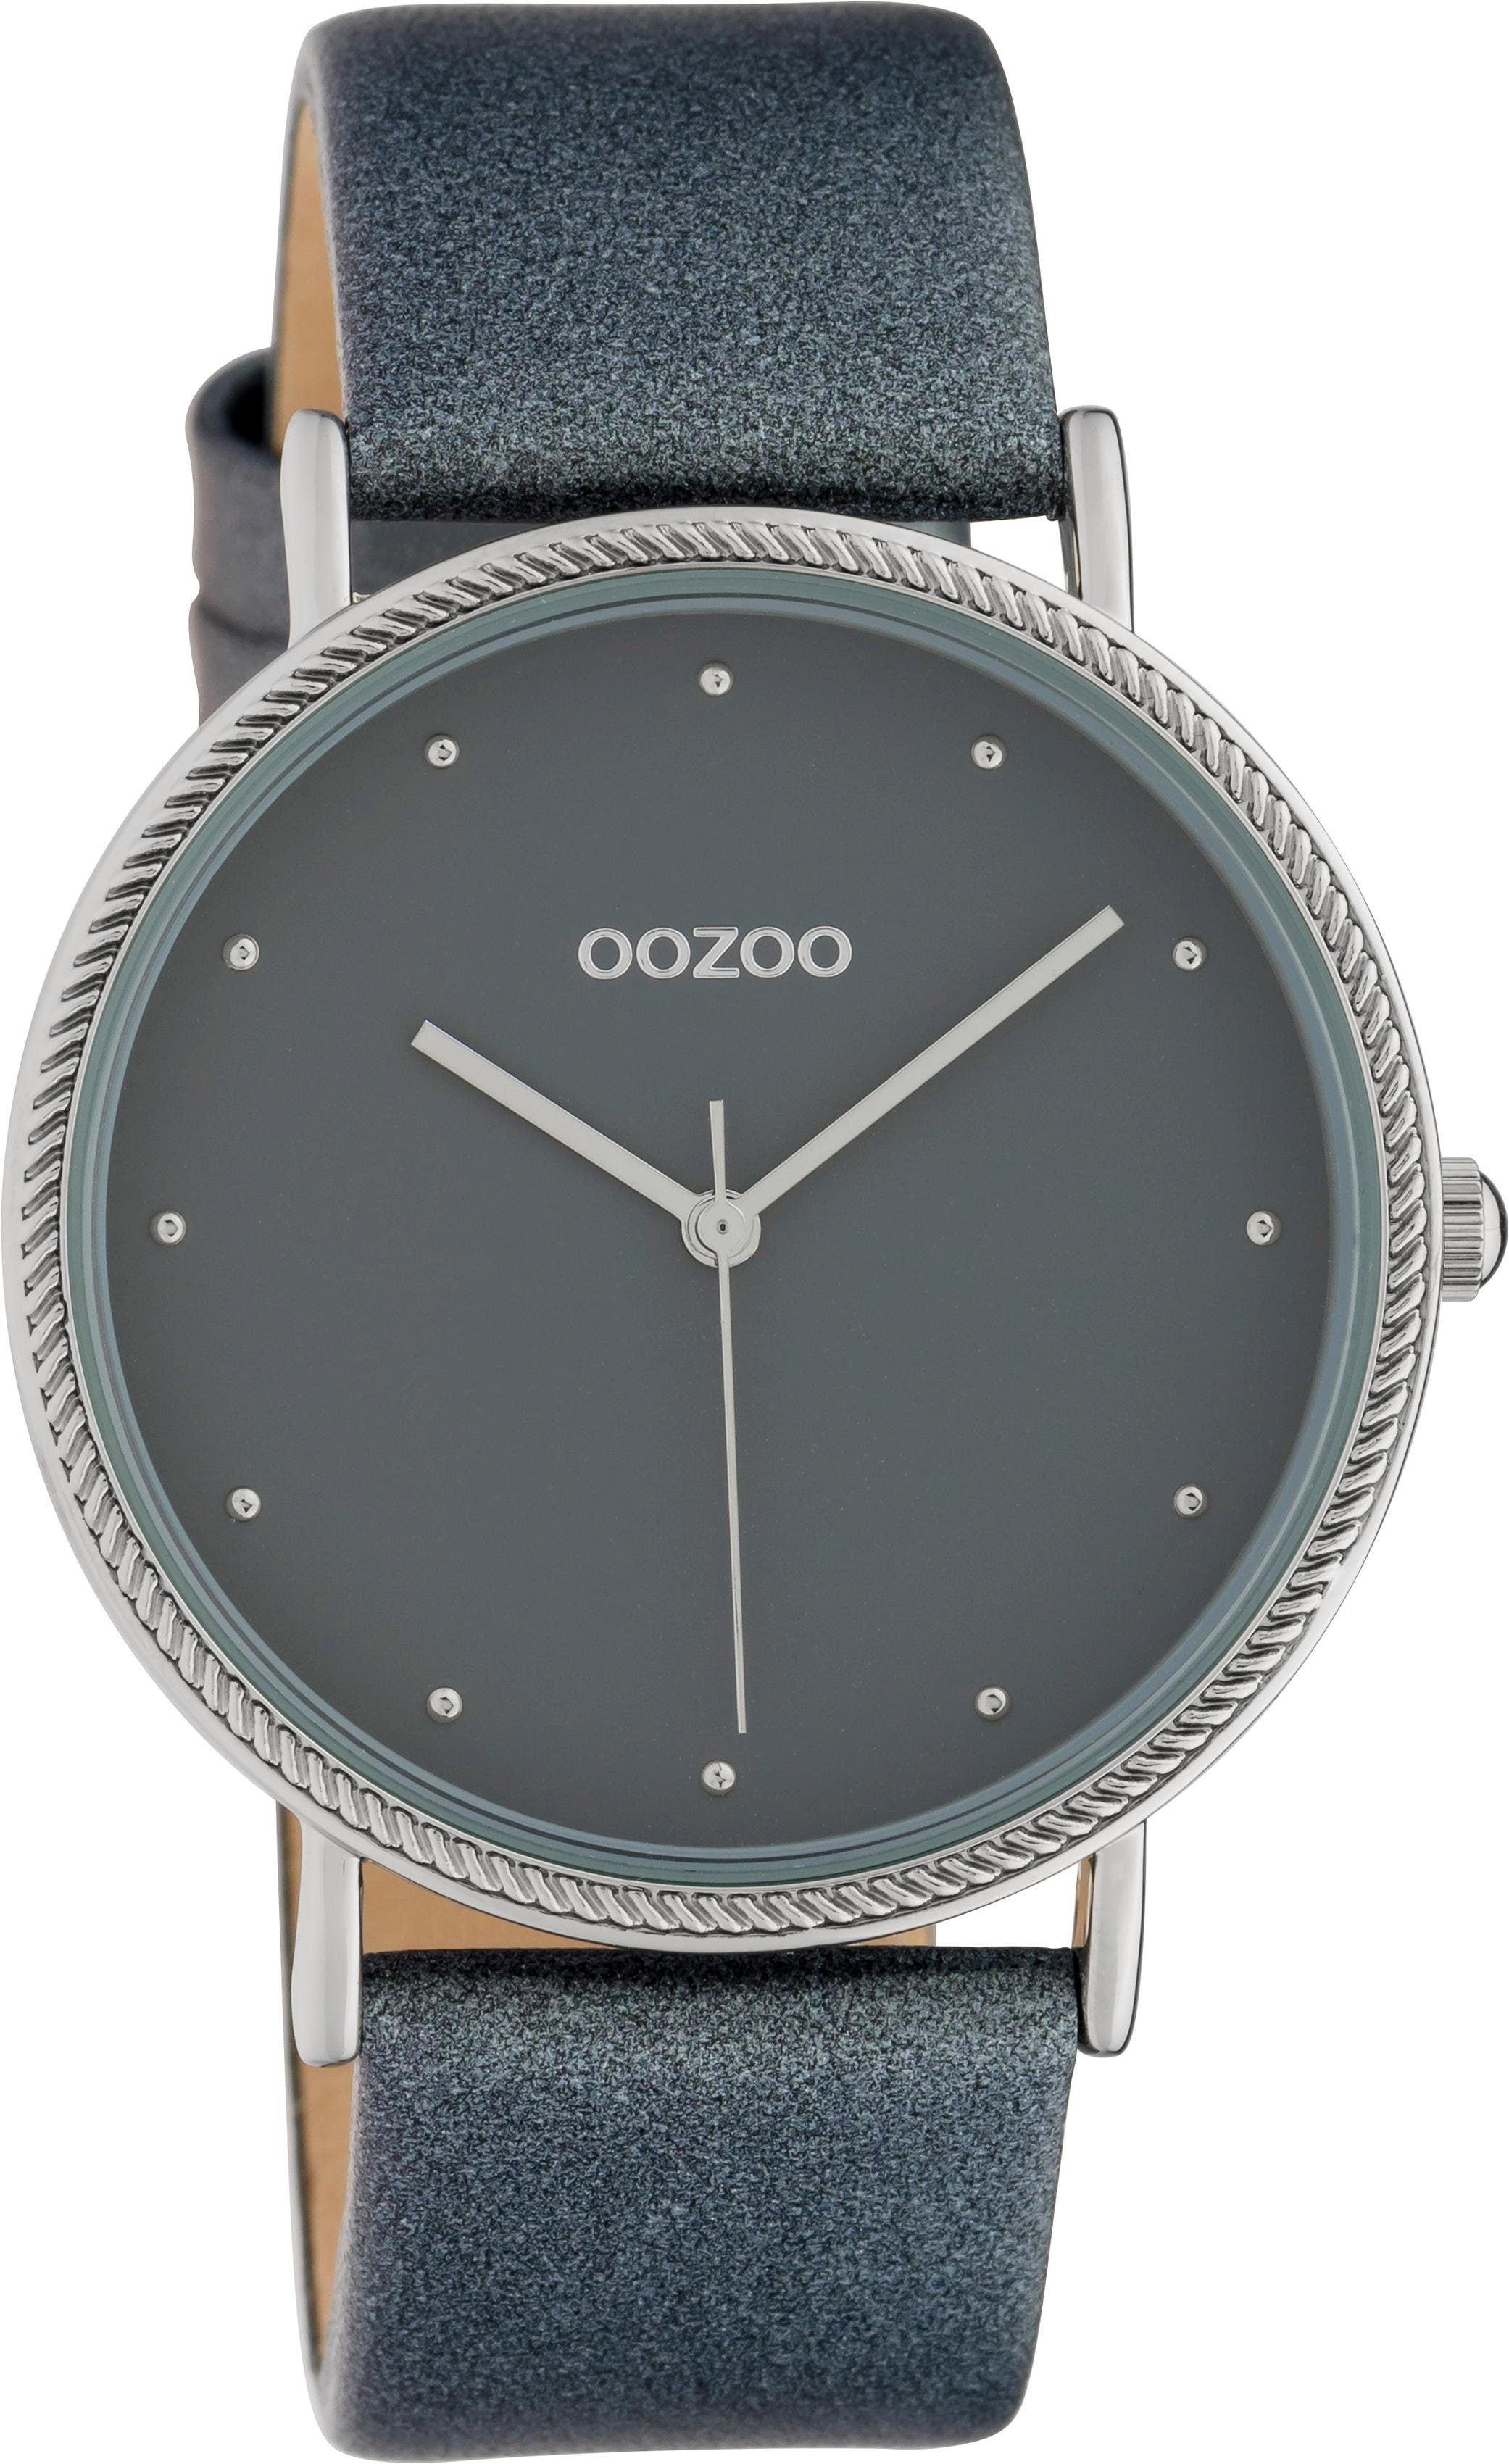 OOZOO Quarzuhr C10418   Uhren   Oozoo